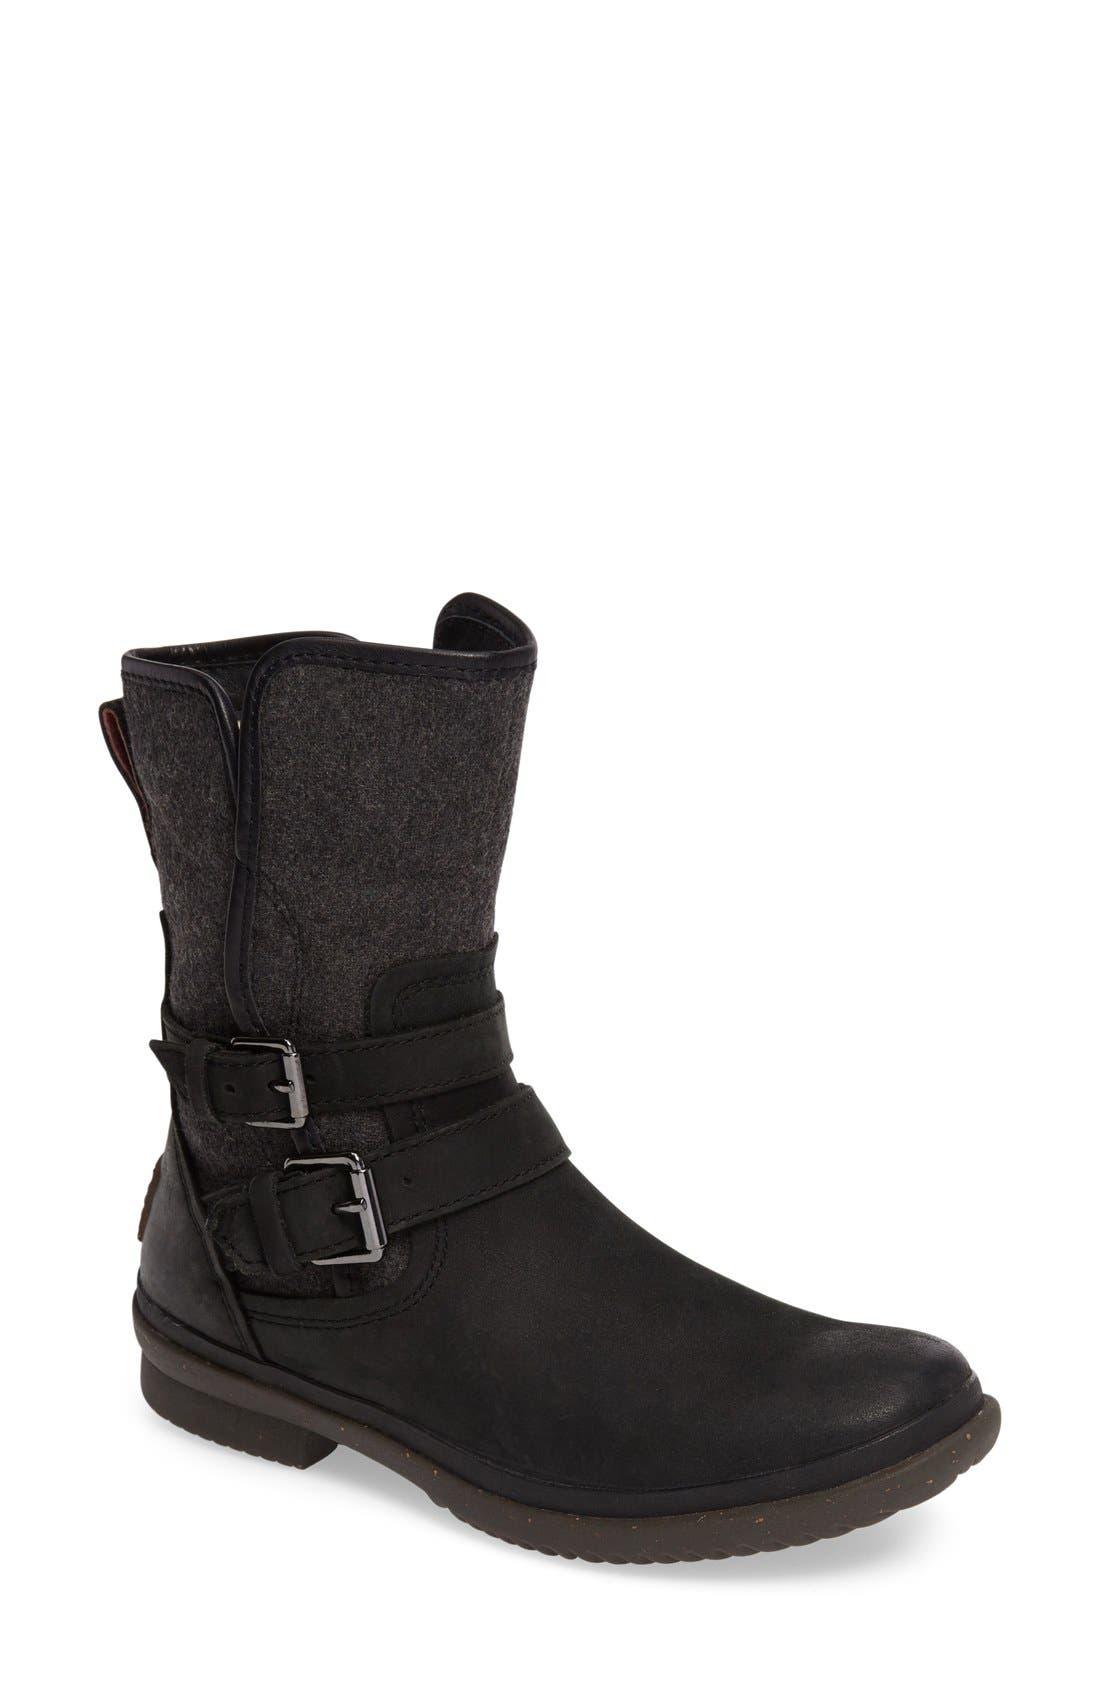 7979f58b391 Women's Winter & Snow Boots | Nordstrom